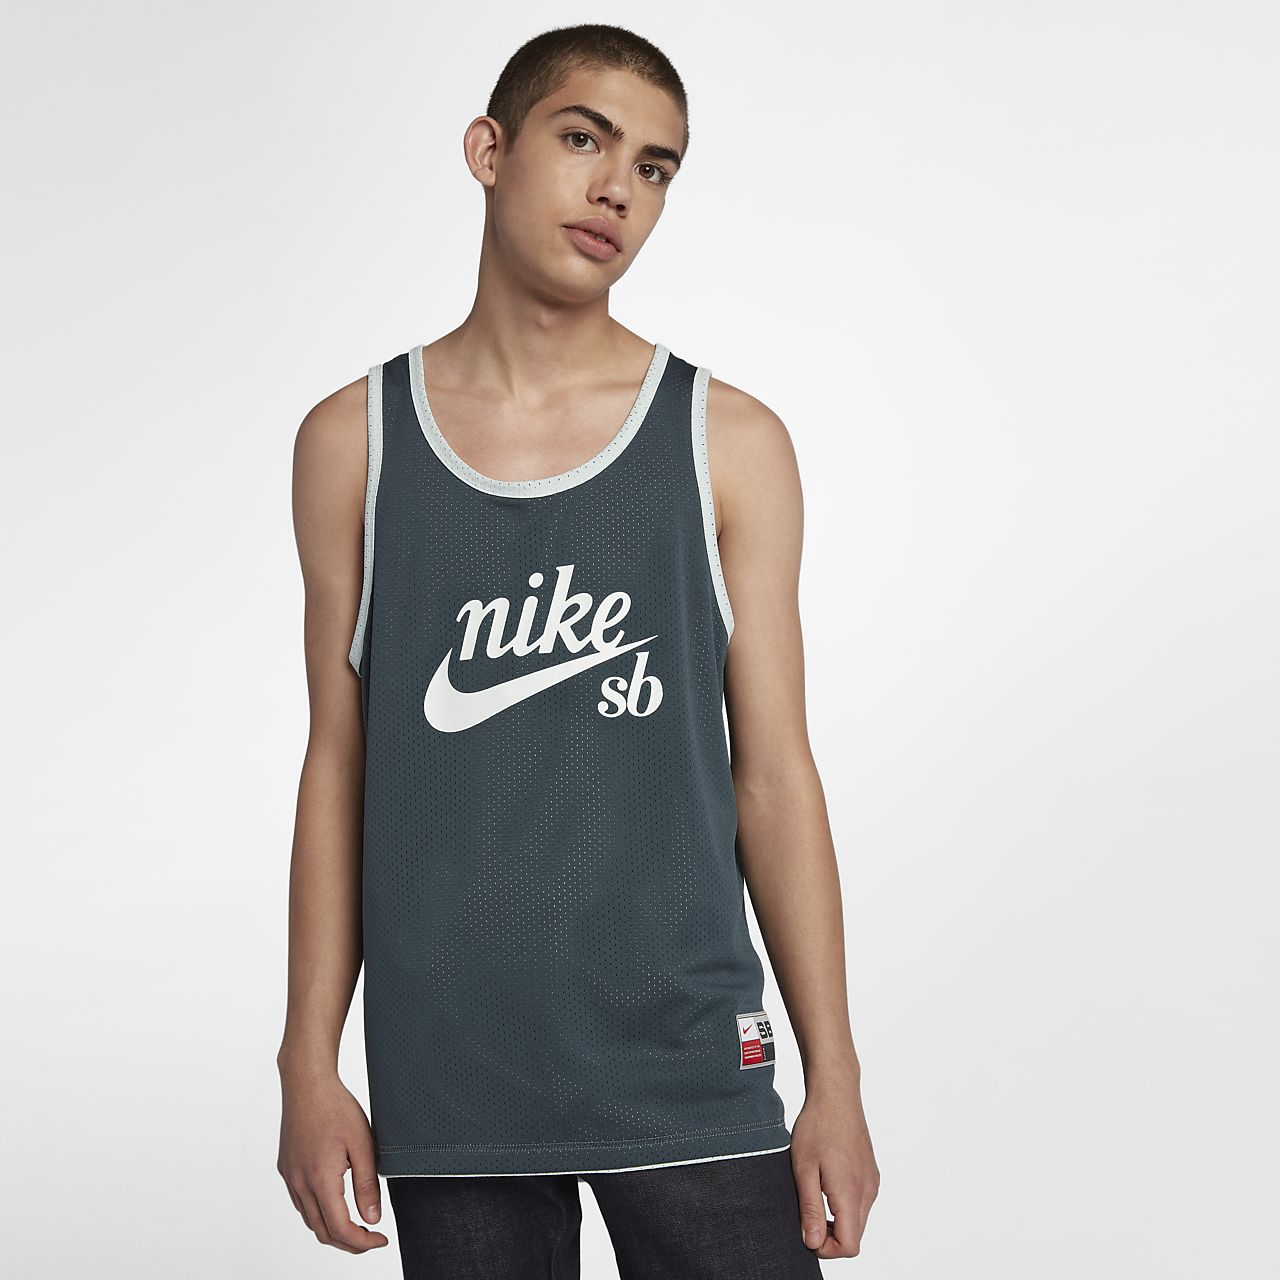 Nike SB Dri FIT Reversible Tanktop für Herren